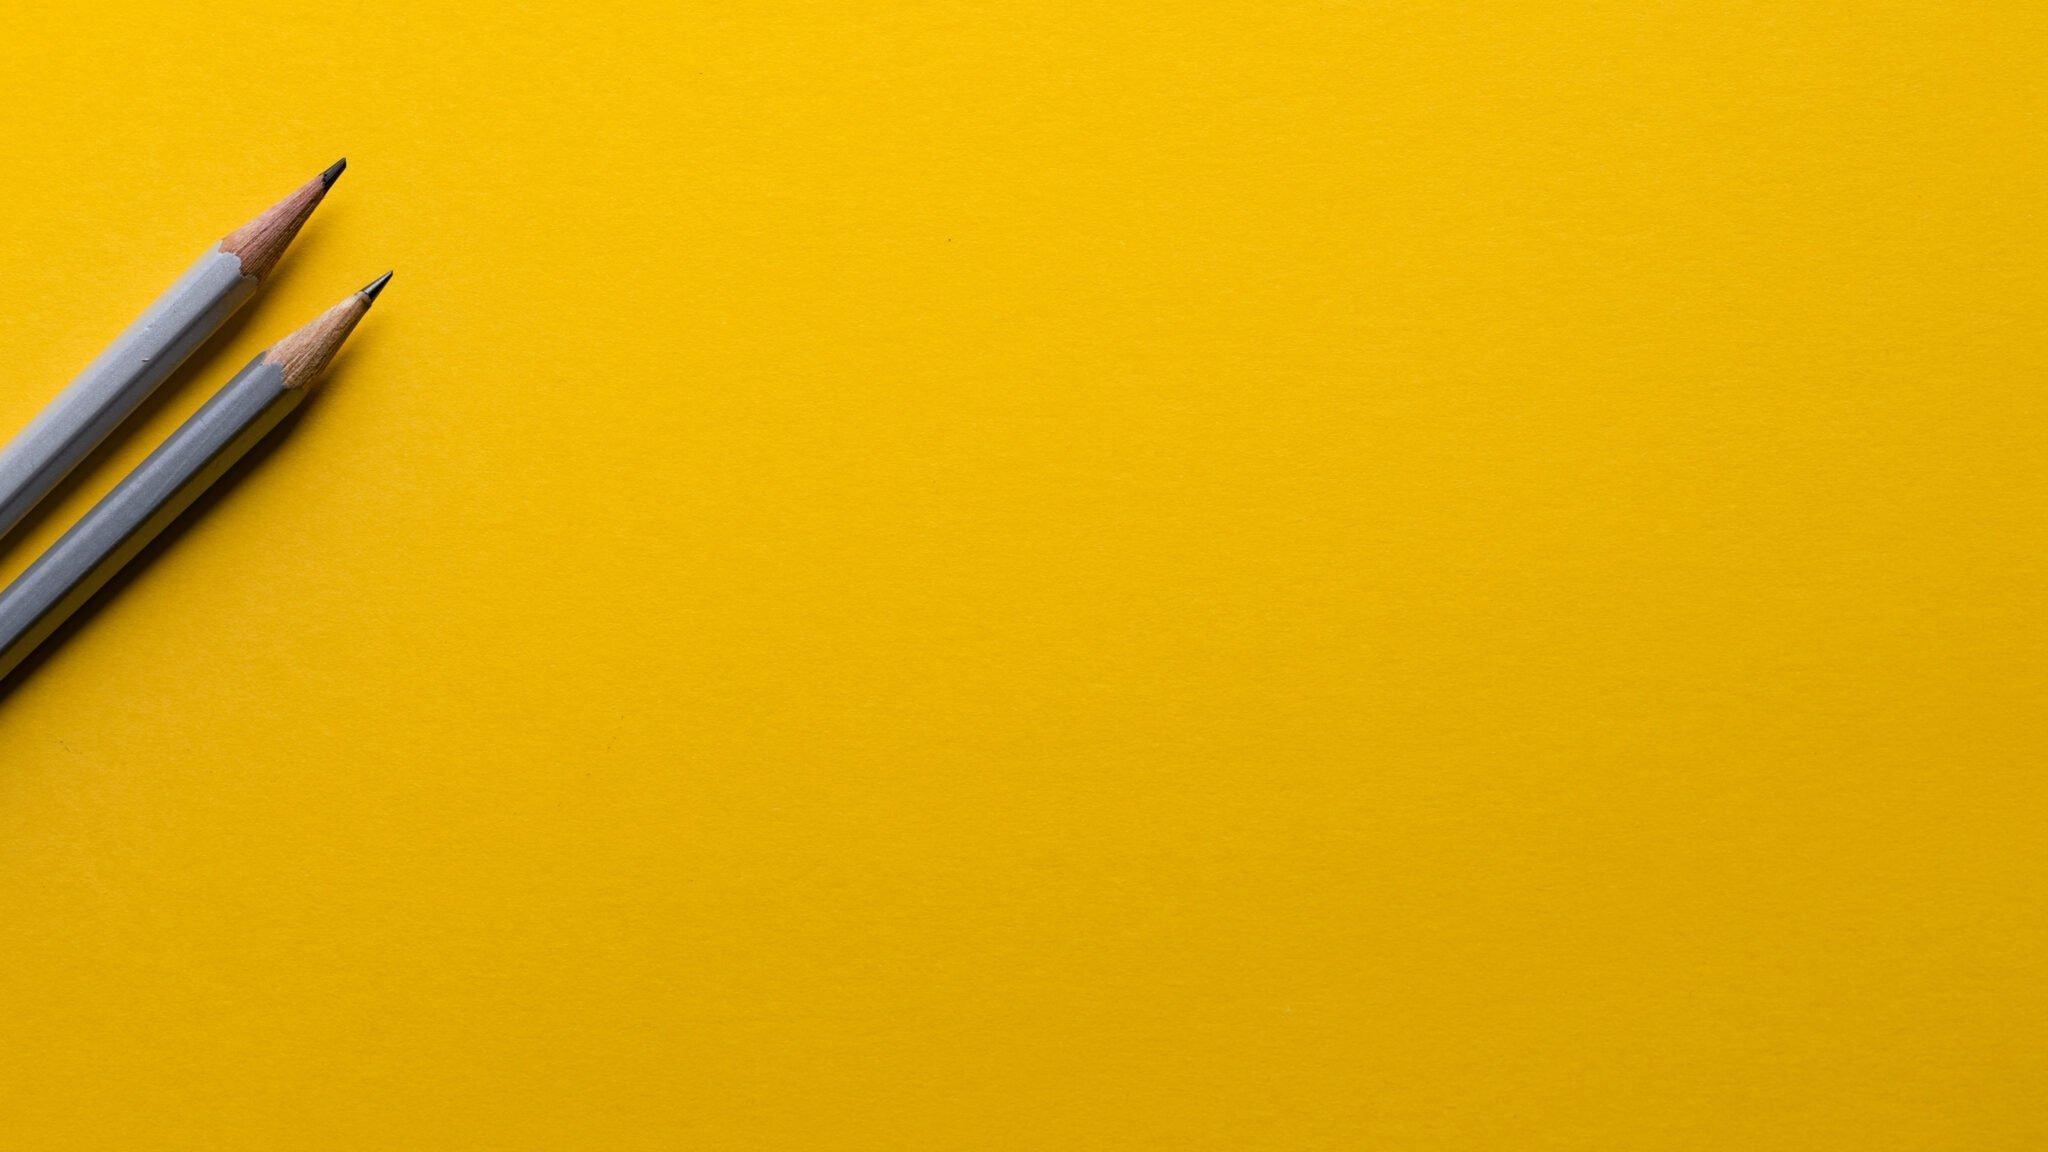 Pennor på gult papper